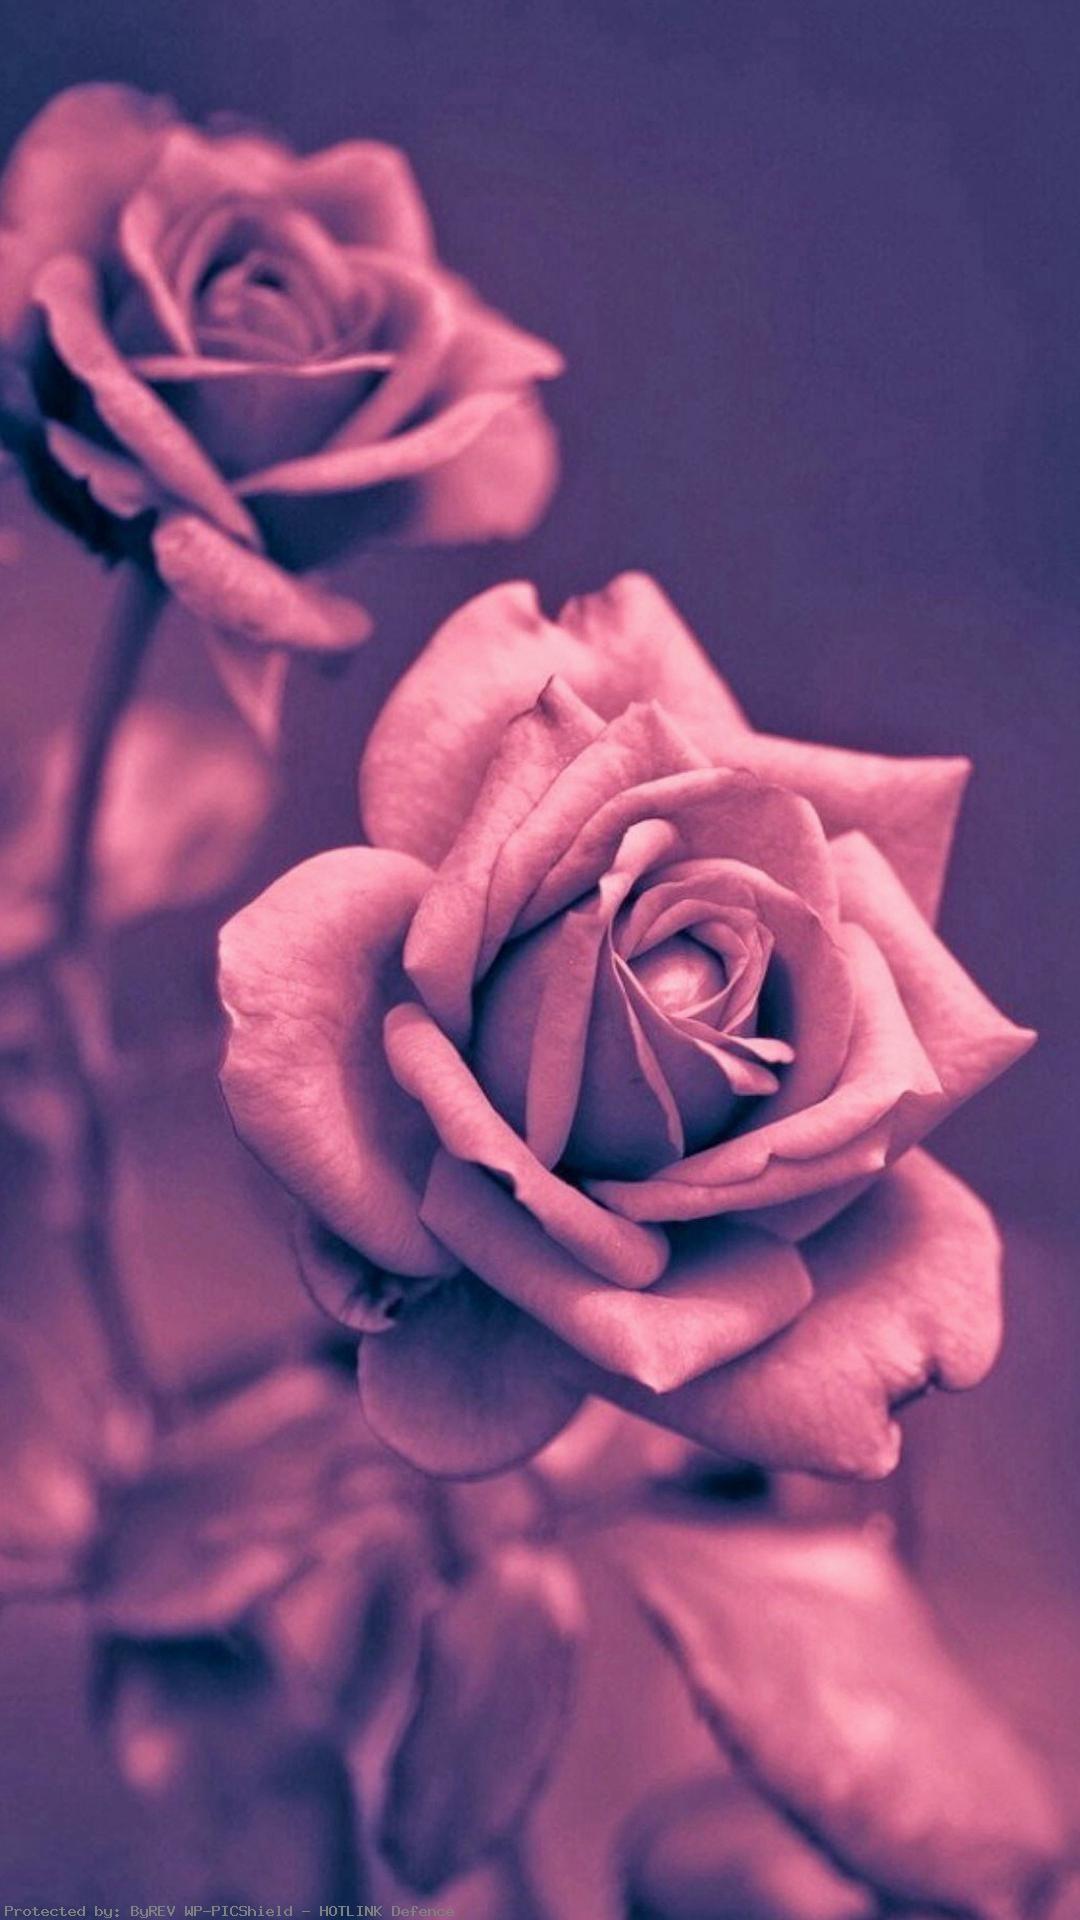 Beautiful-Pink-Rose-Closeup-iPhone-wallpaper-wpc9002724